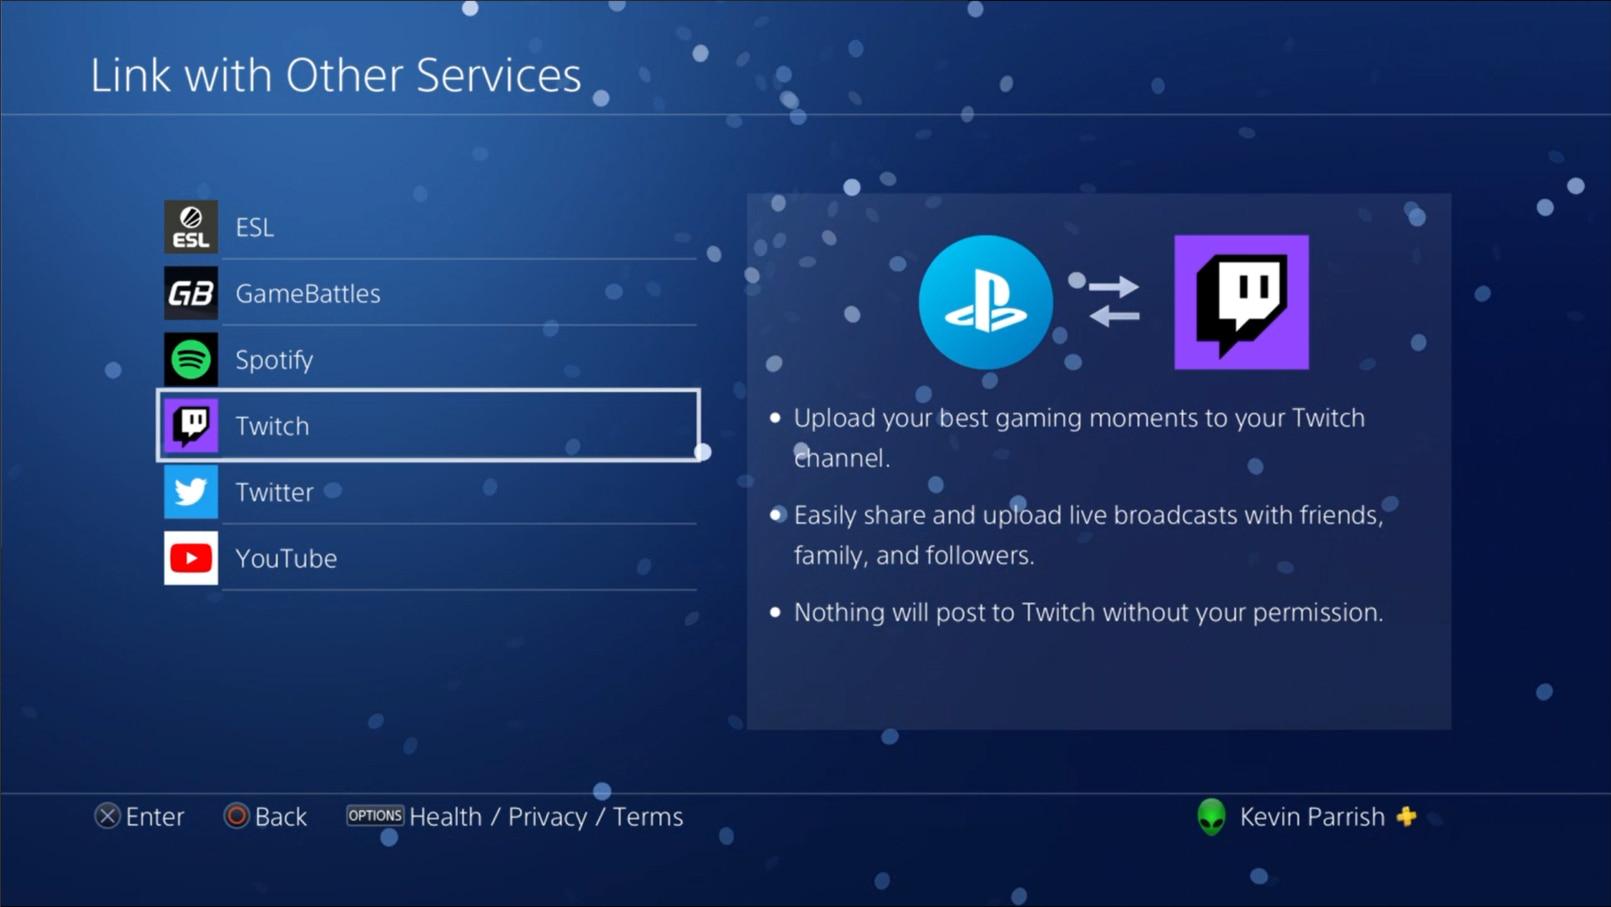 PlayStation 4 Link Twitch